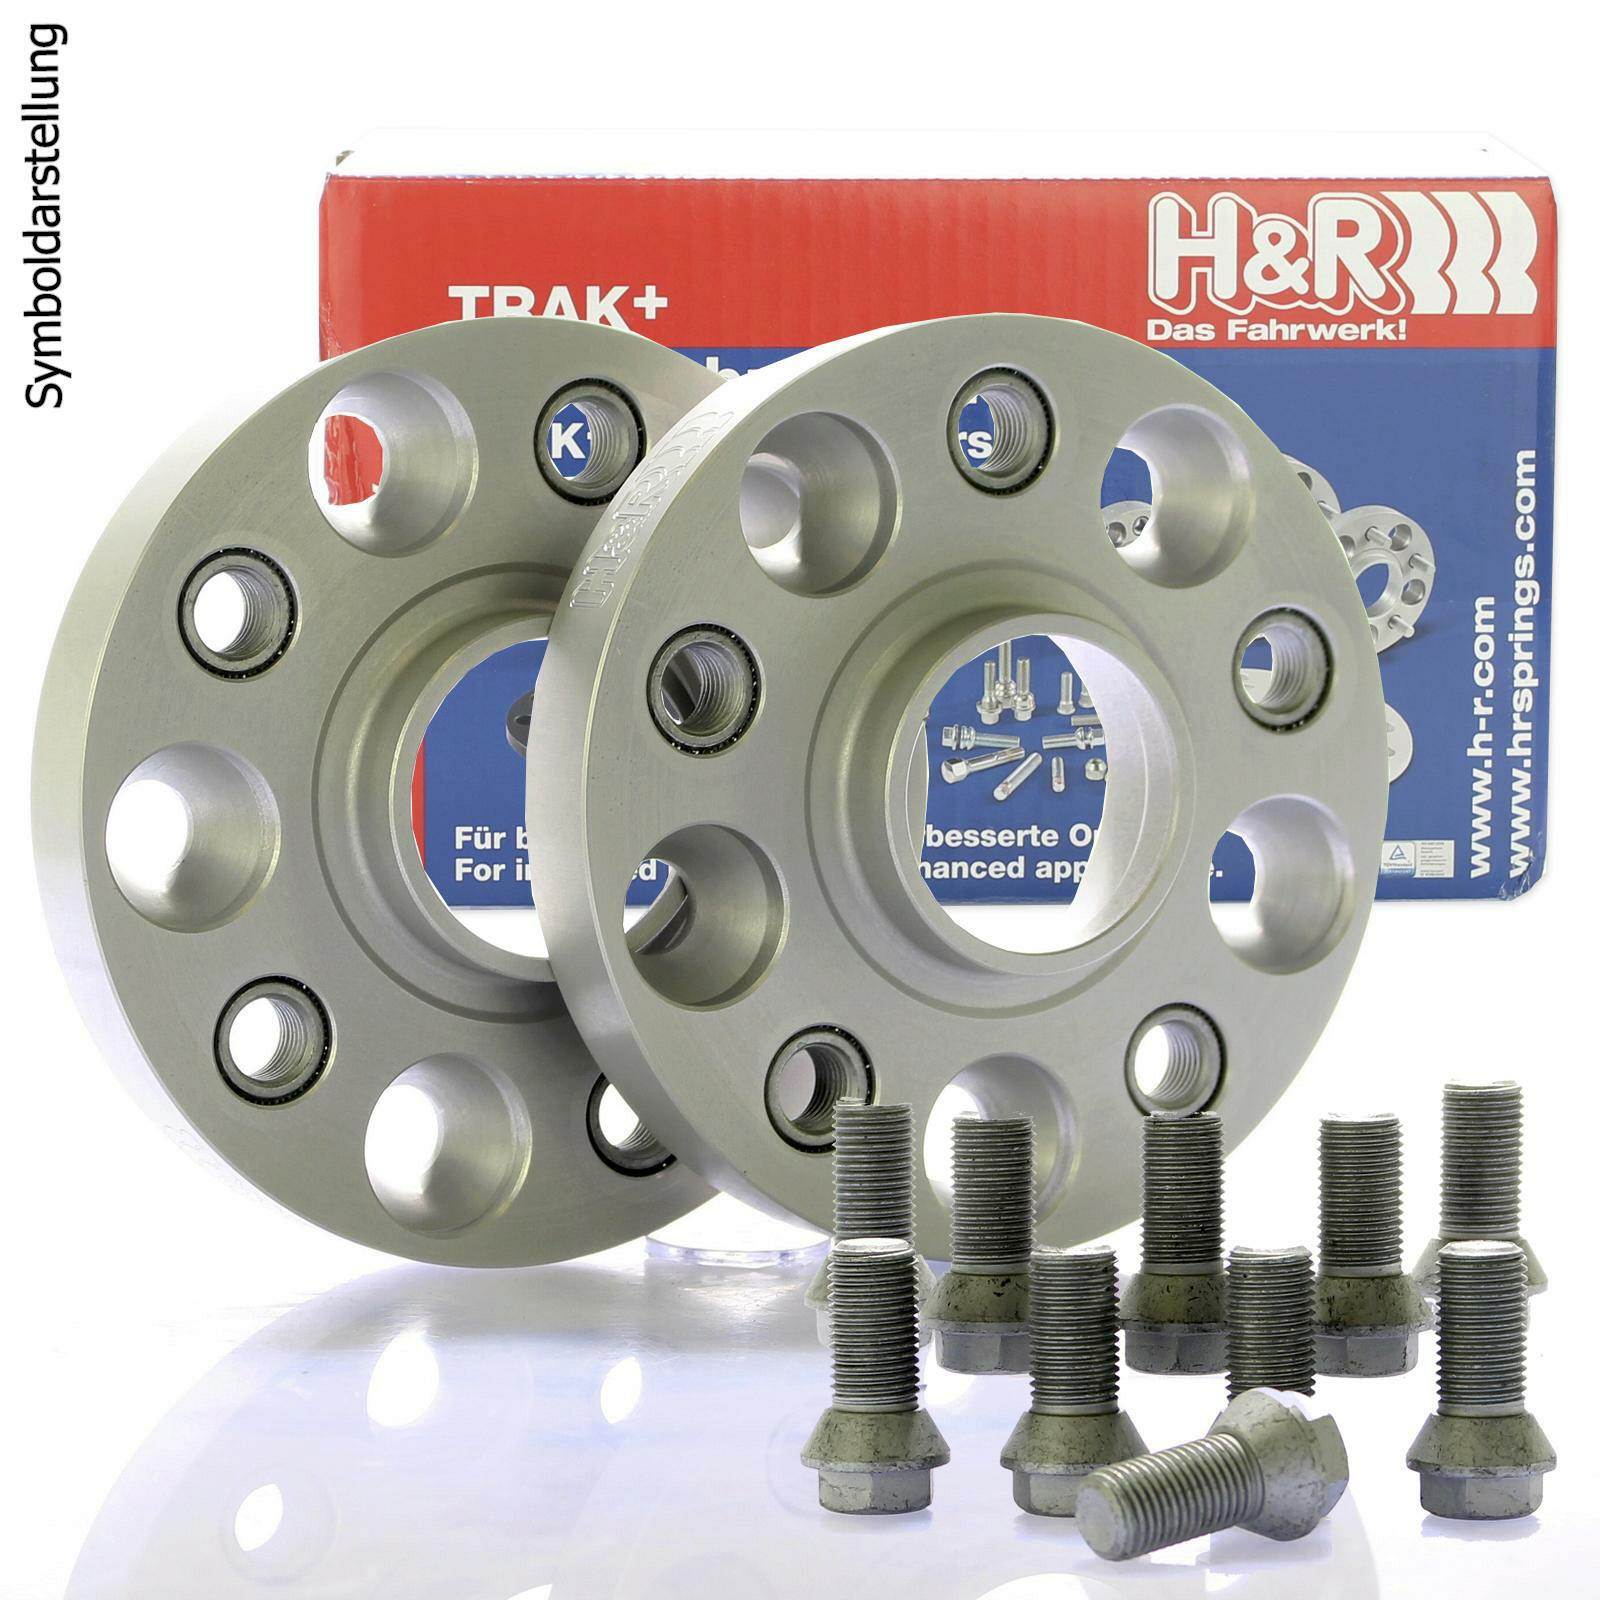 H&R DRA Spurplatten Spurverbreiterung Distanzscheibe 5x100 40mm // 2x20mm